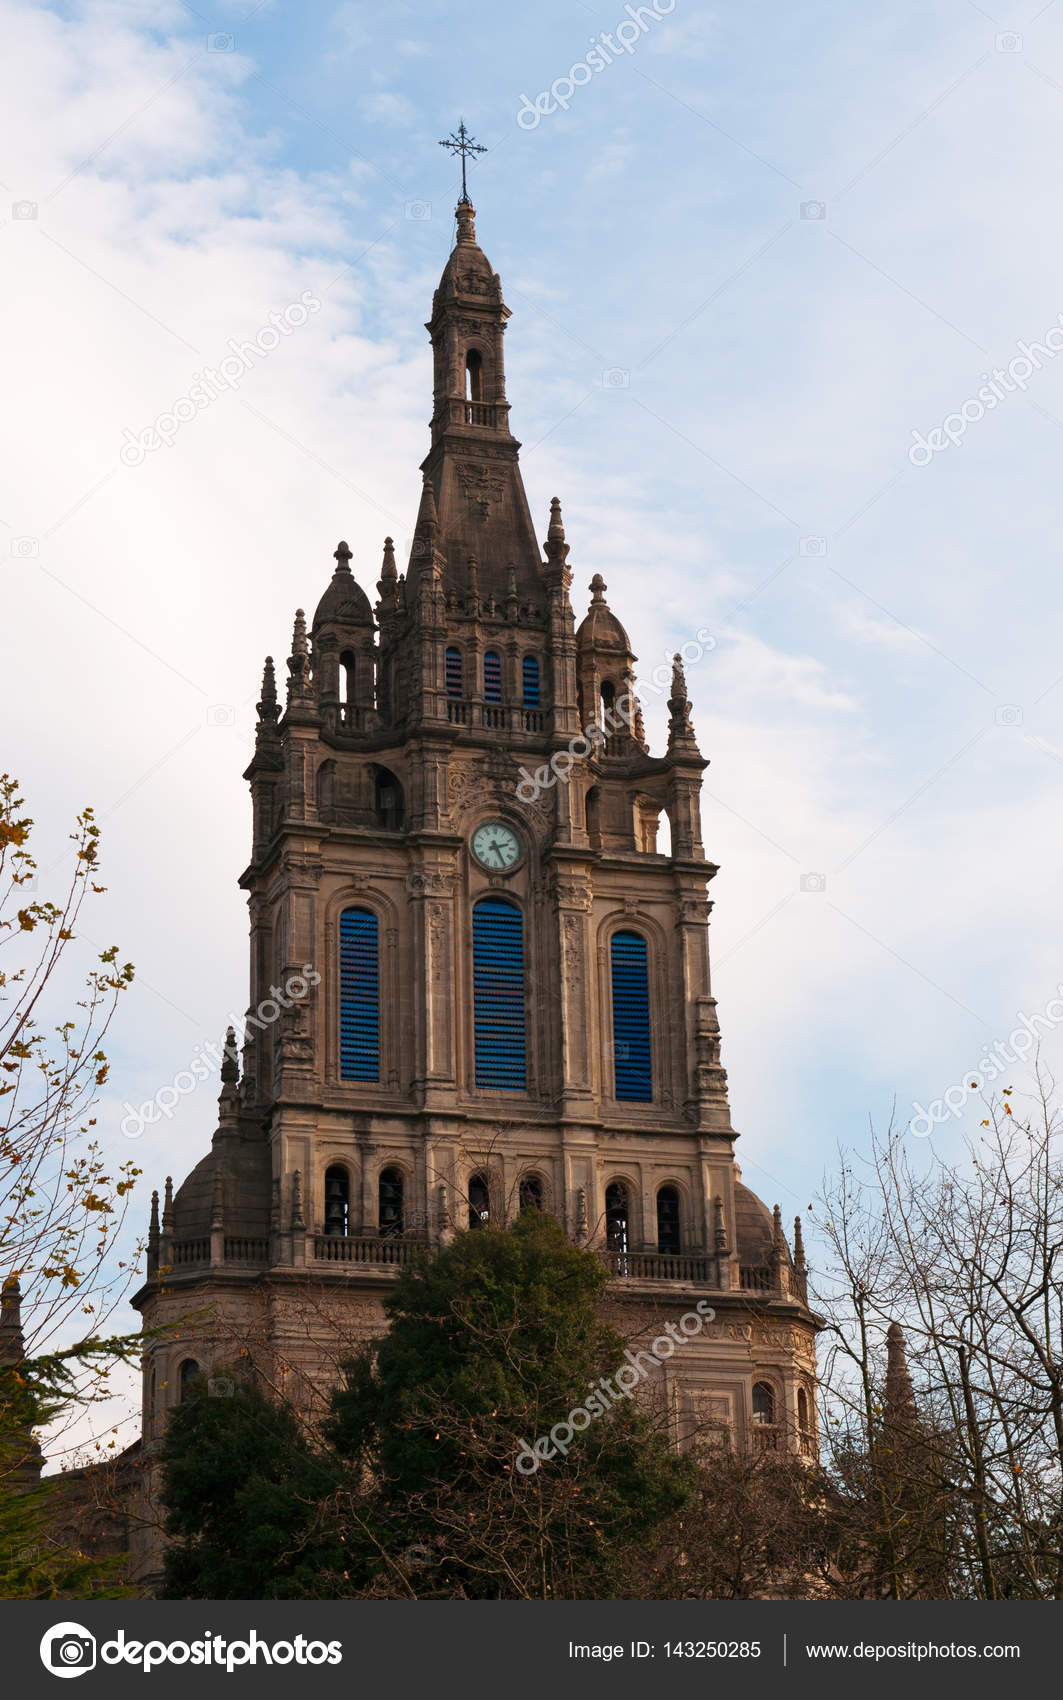 Bilbao The Basilica Of Begona A Xvi Century Church In Gothic And